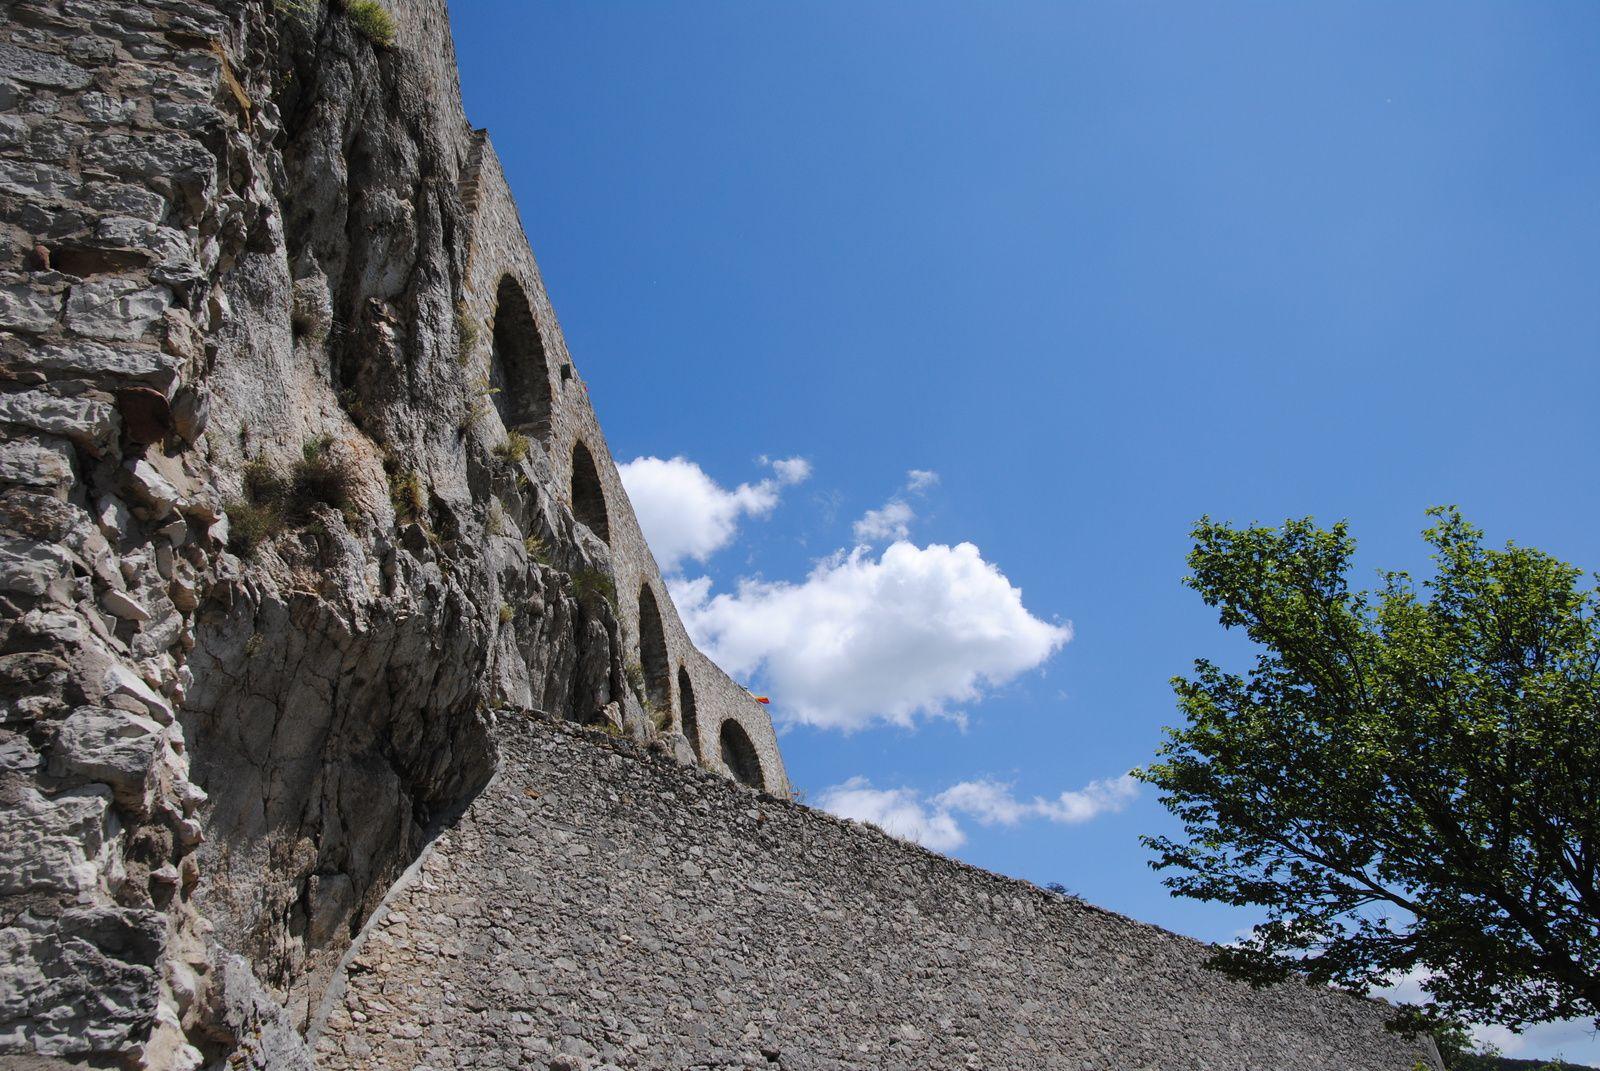 Le cachot du donjon où était enfermé Le prince  Jean Casimir Vasa !